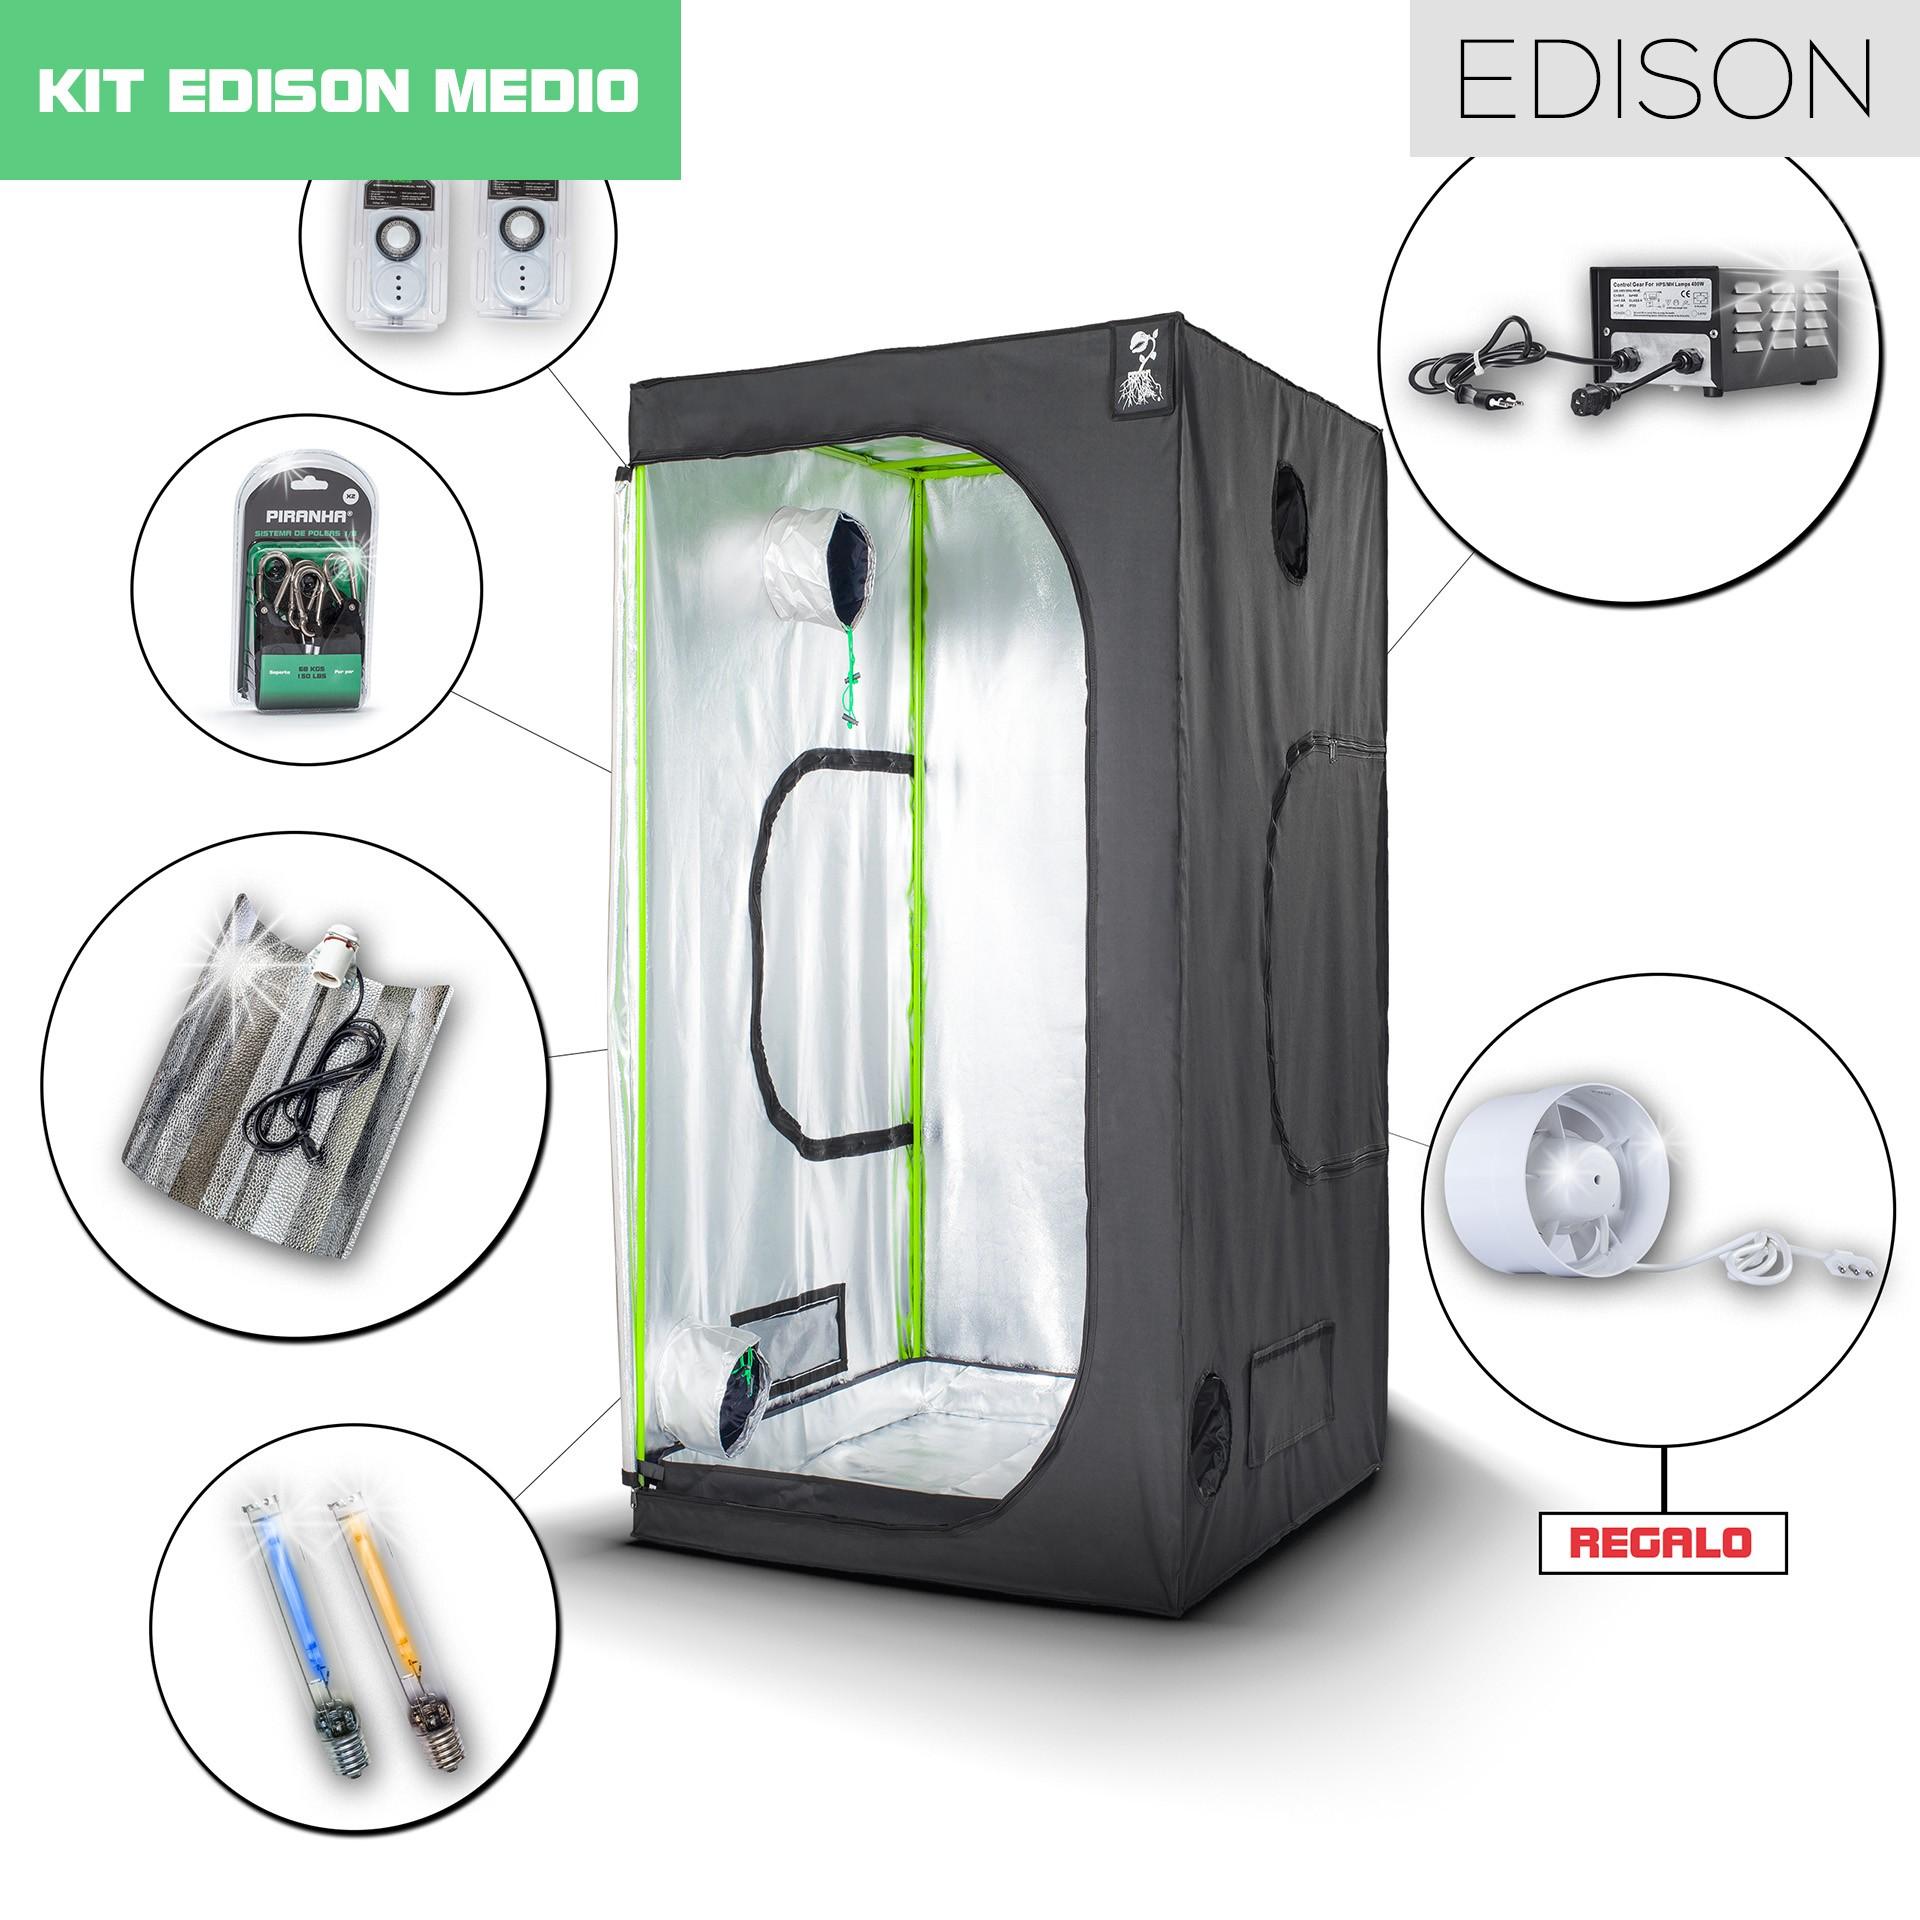 Kit Edison Pro 100 - 400W Medio